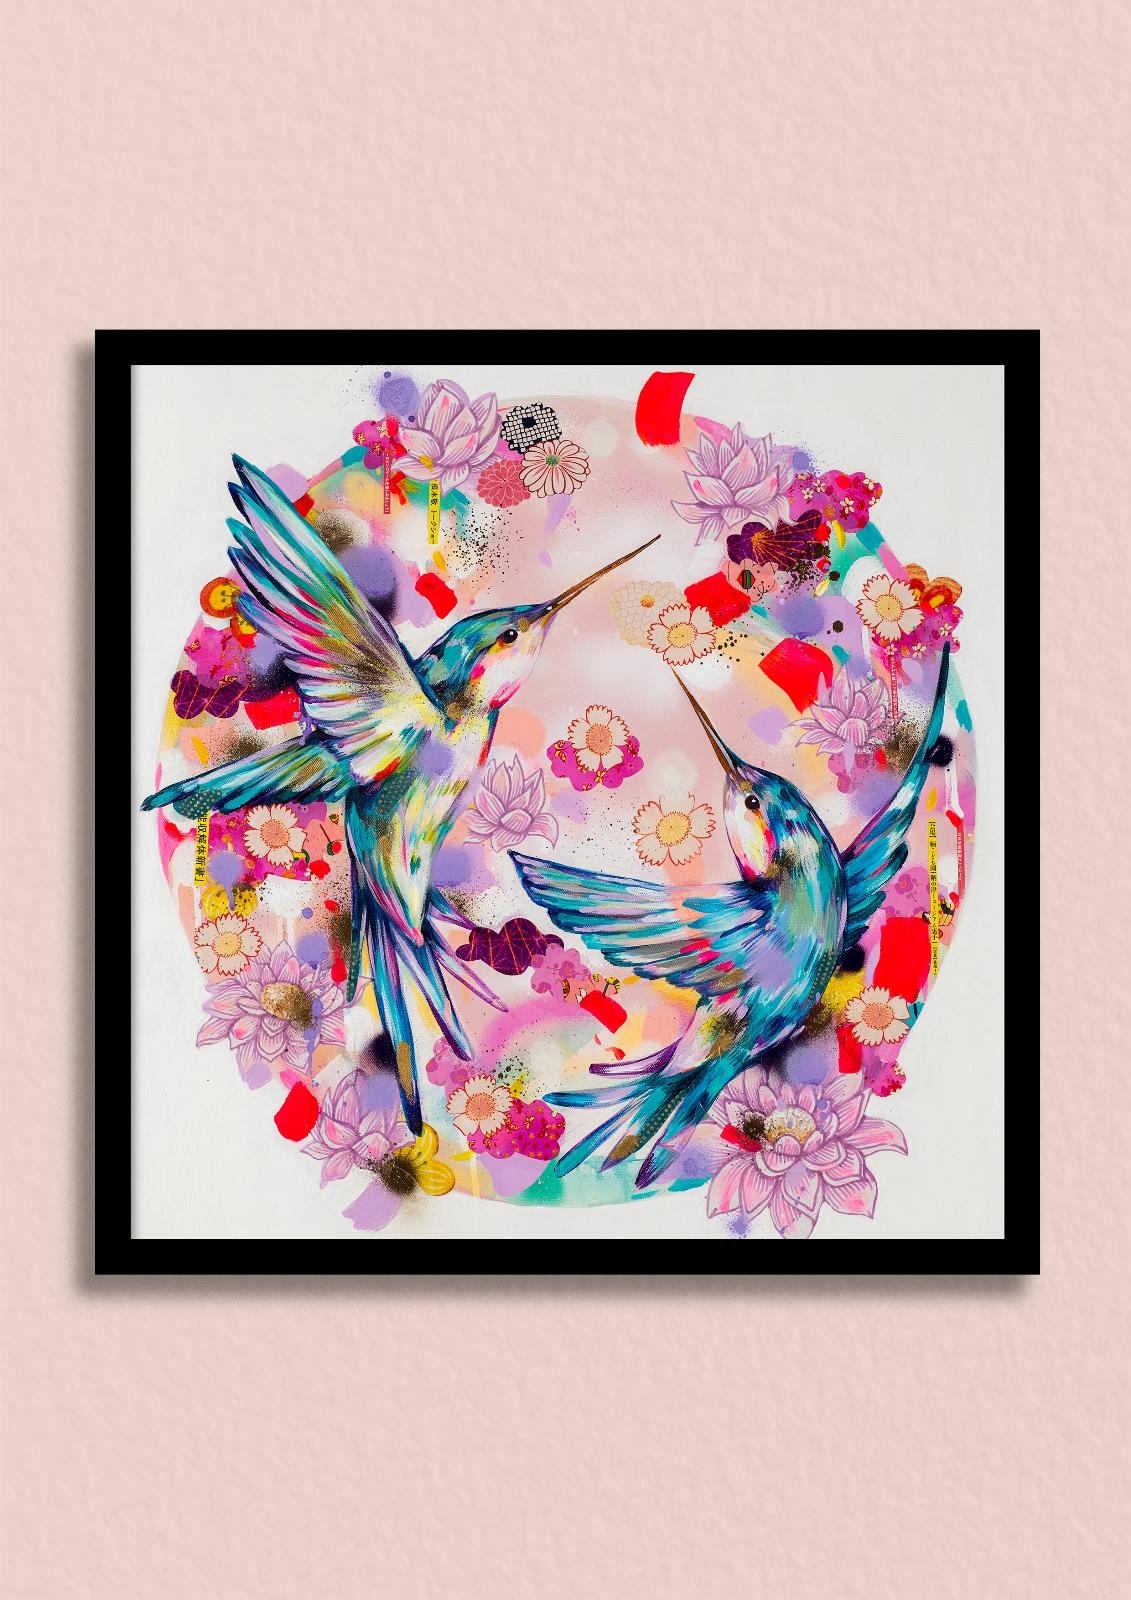 OSAKA SUNRISE - Wake up to the beautiful glow of a Japanese sunrise, with this spectacular hummingbird print.Unframed giclée print £150Framed giclée print £220